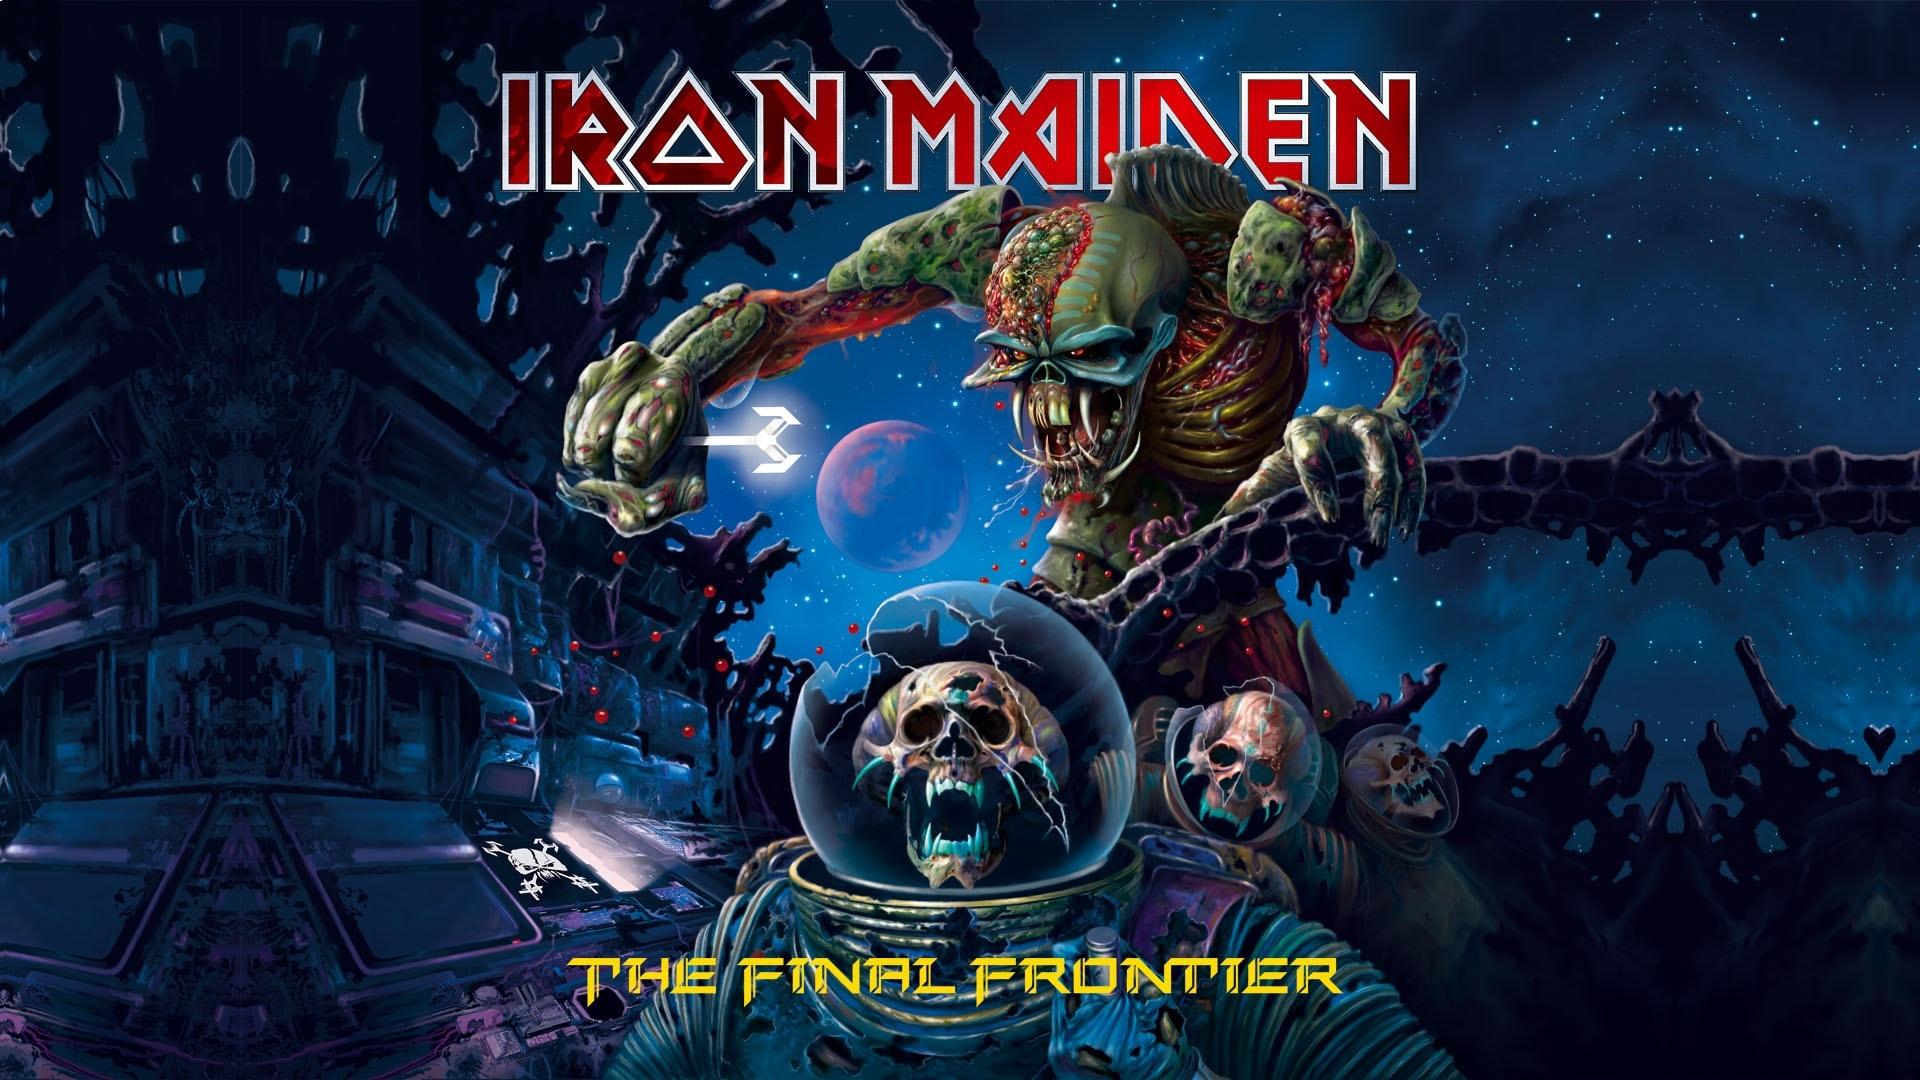 Iron Maiden Screensavers